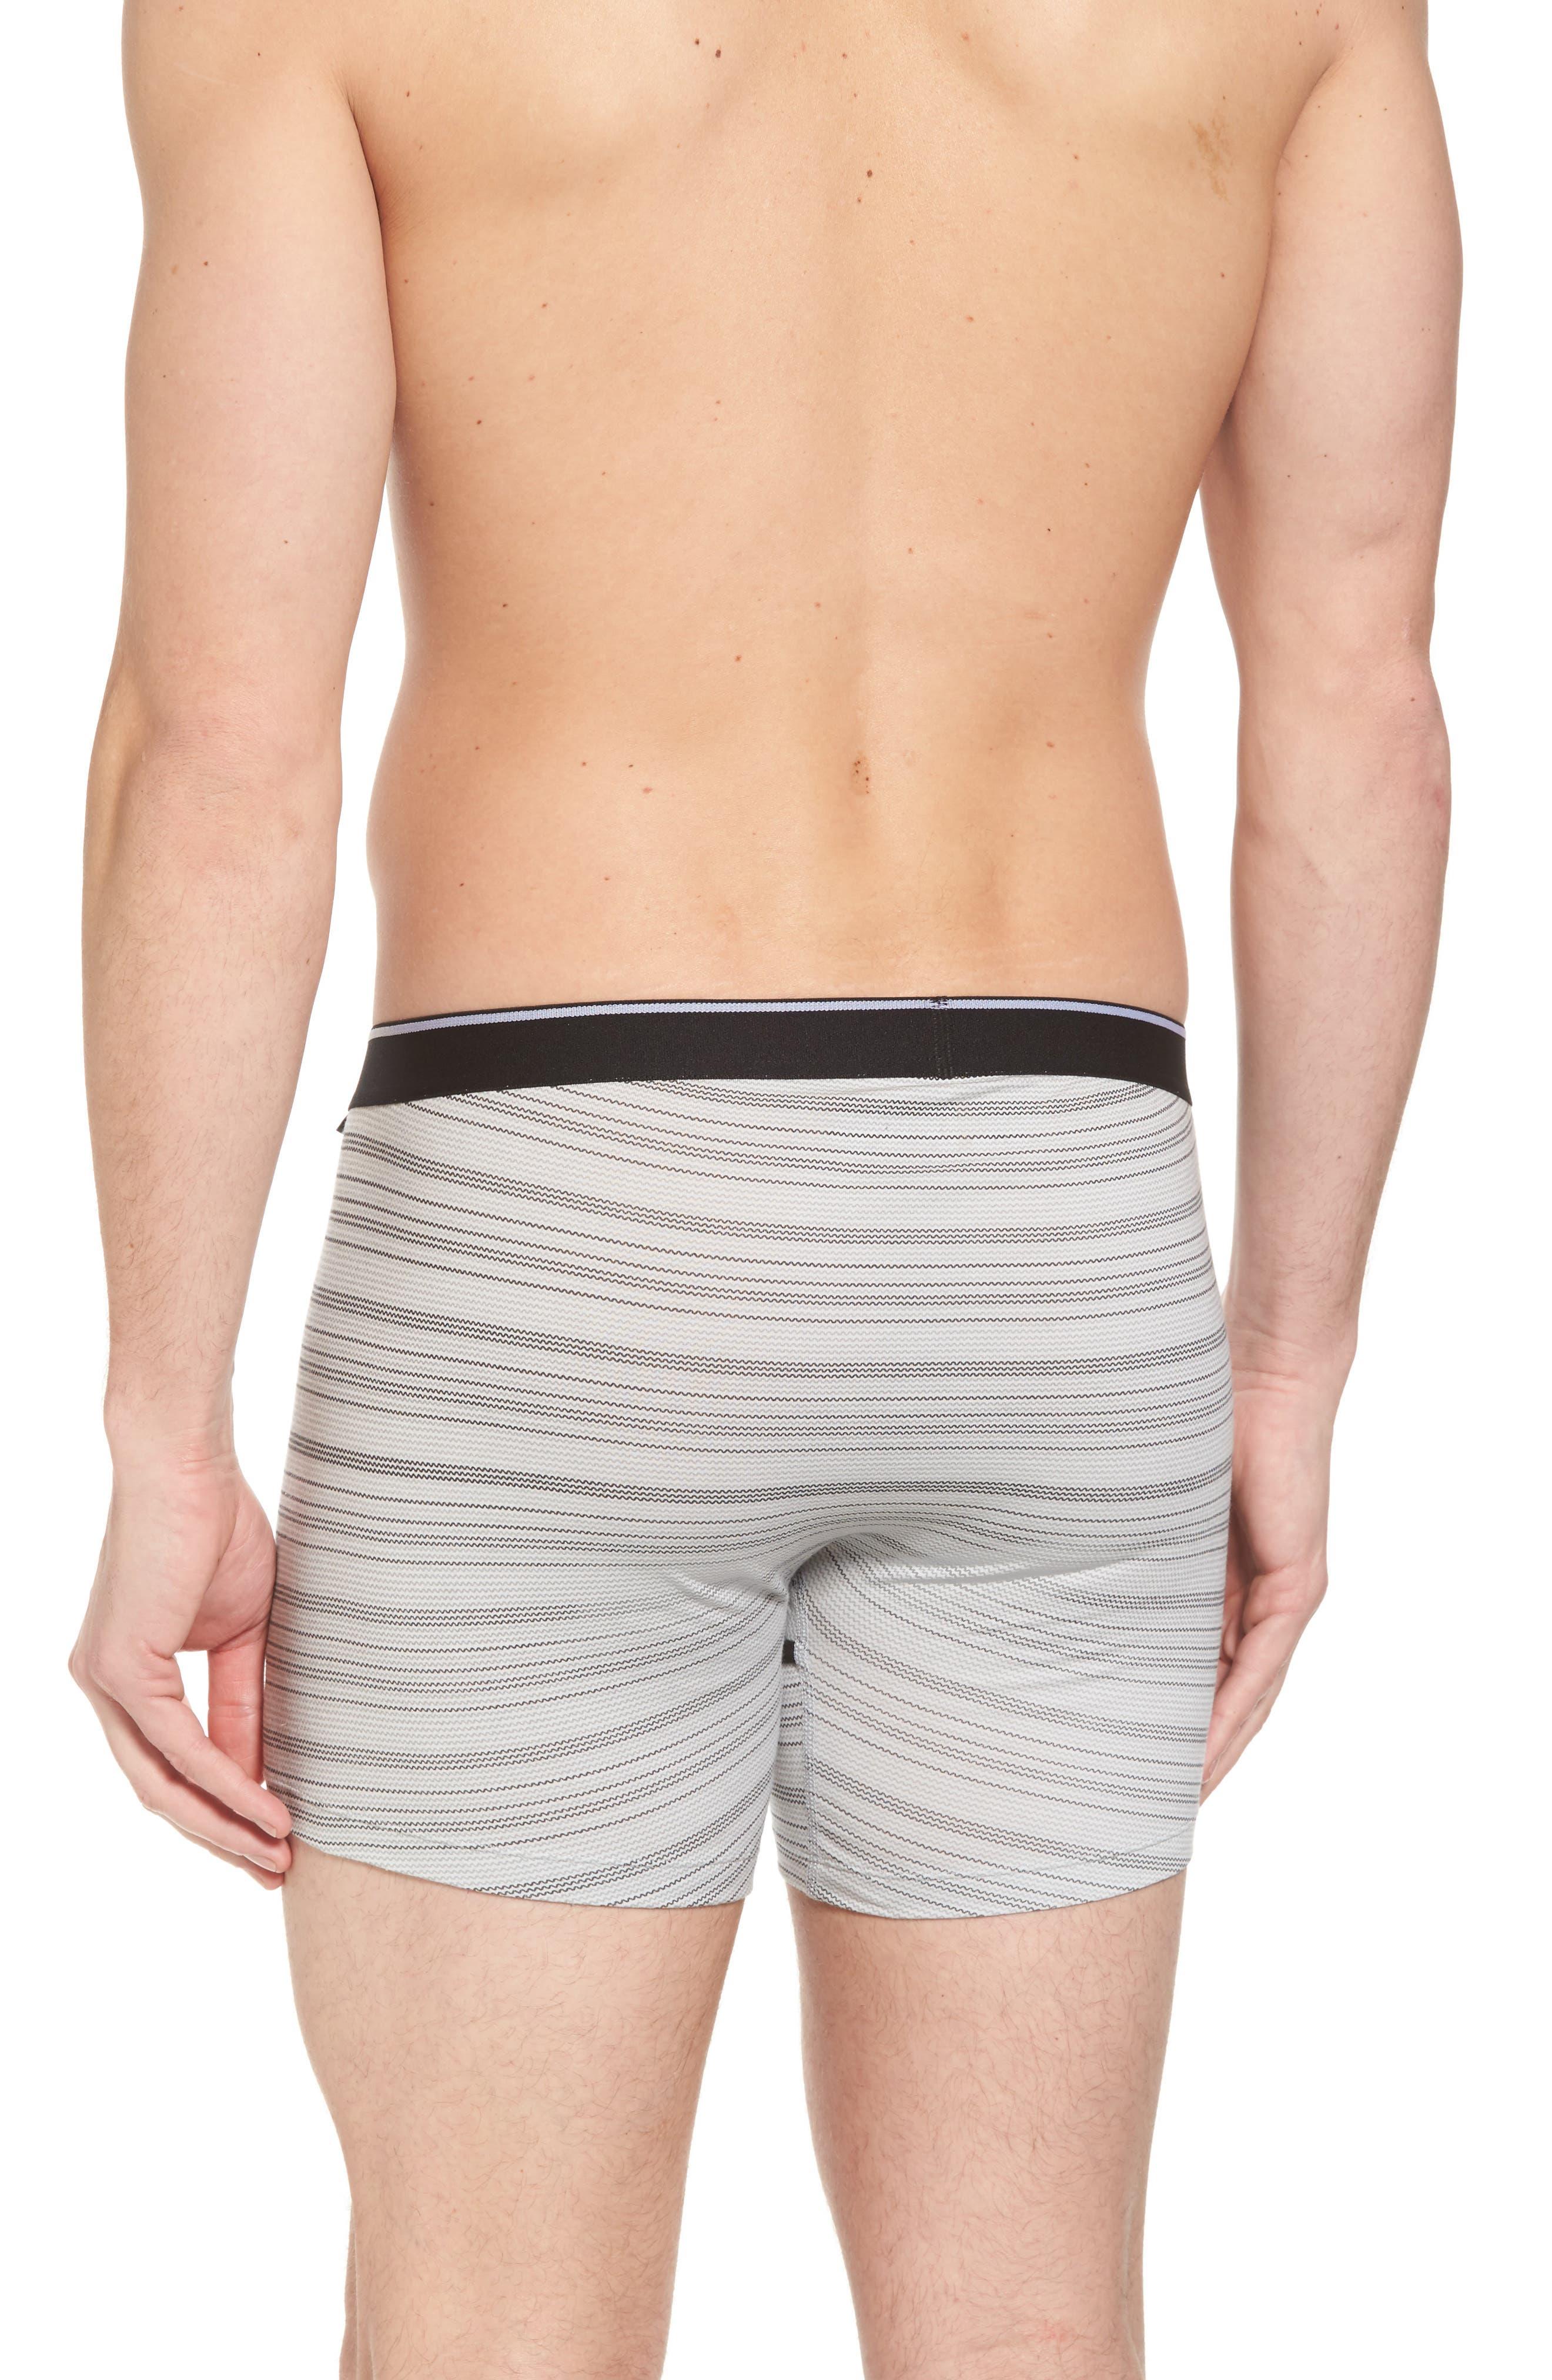 Boxer Briefs,                             Alternate thumbnail 2, color,                             Grey- Black Zig Zag Stripe